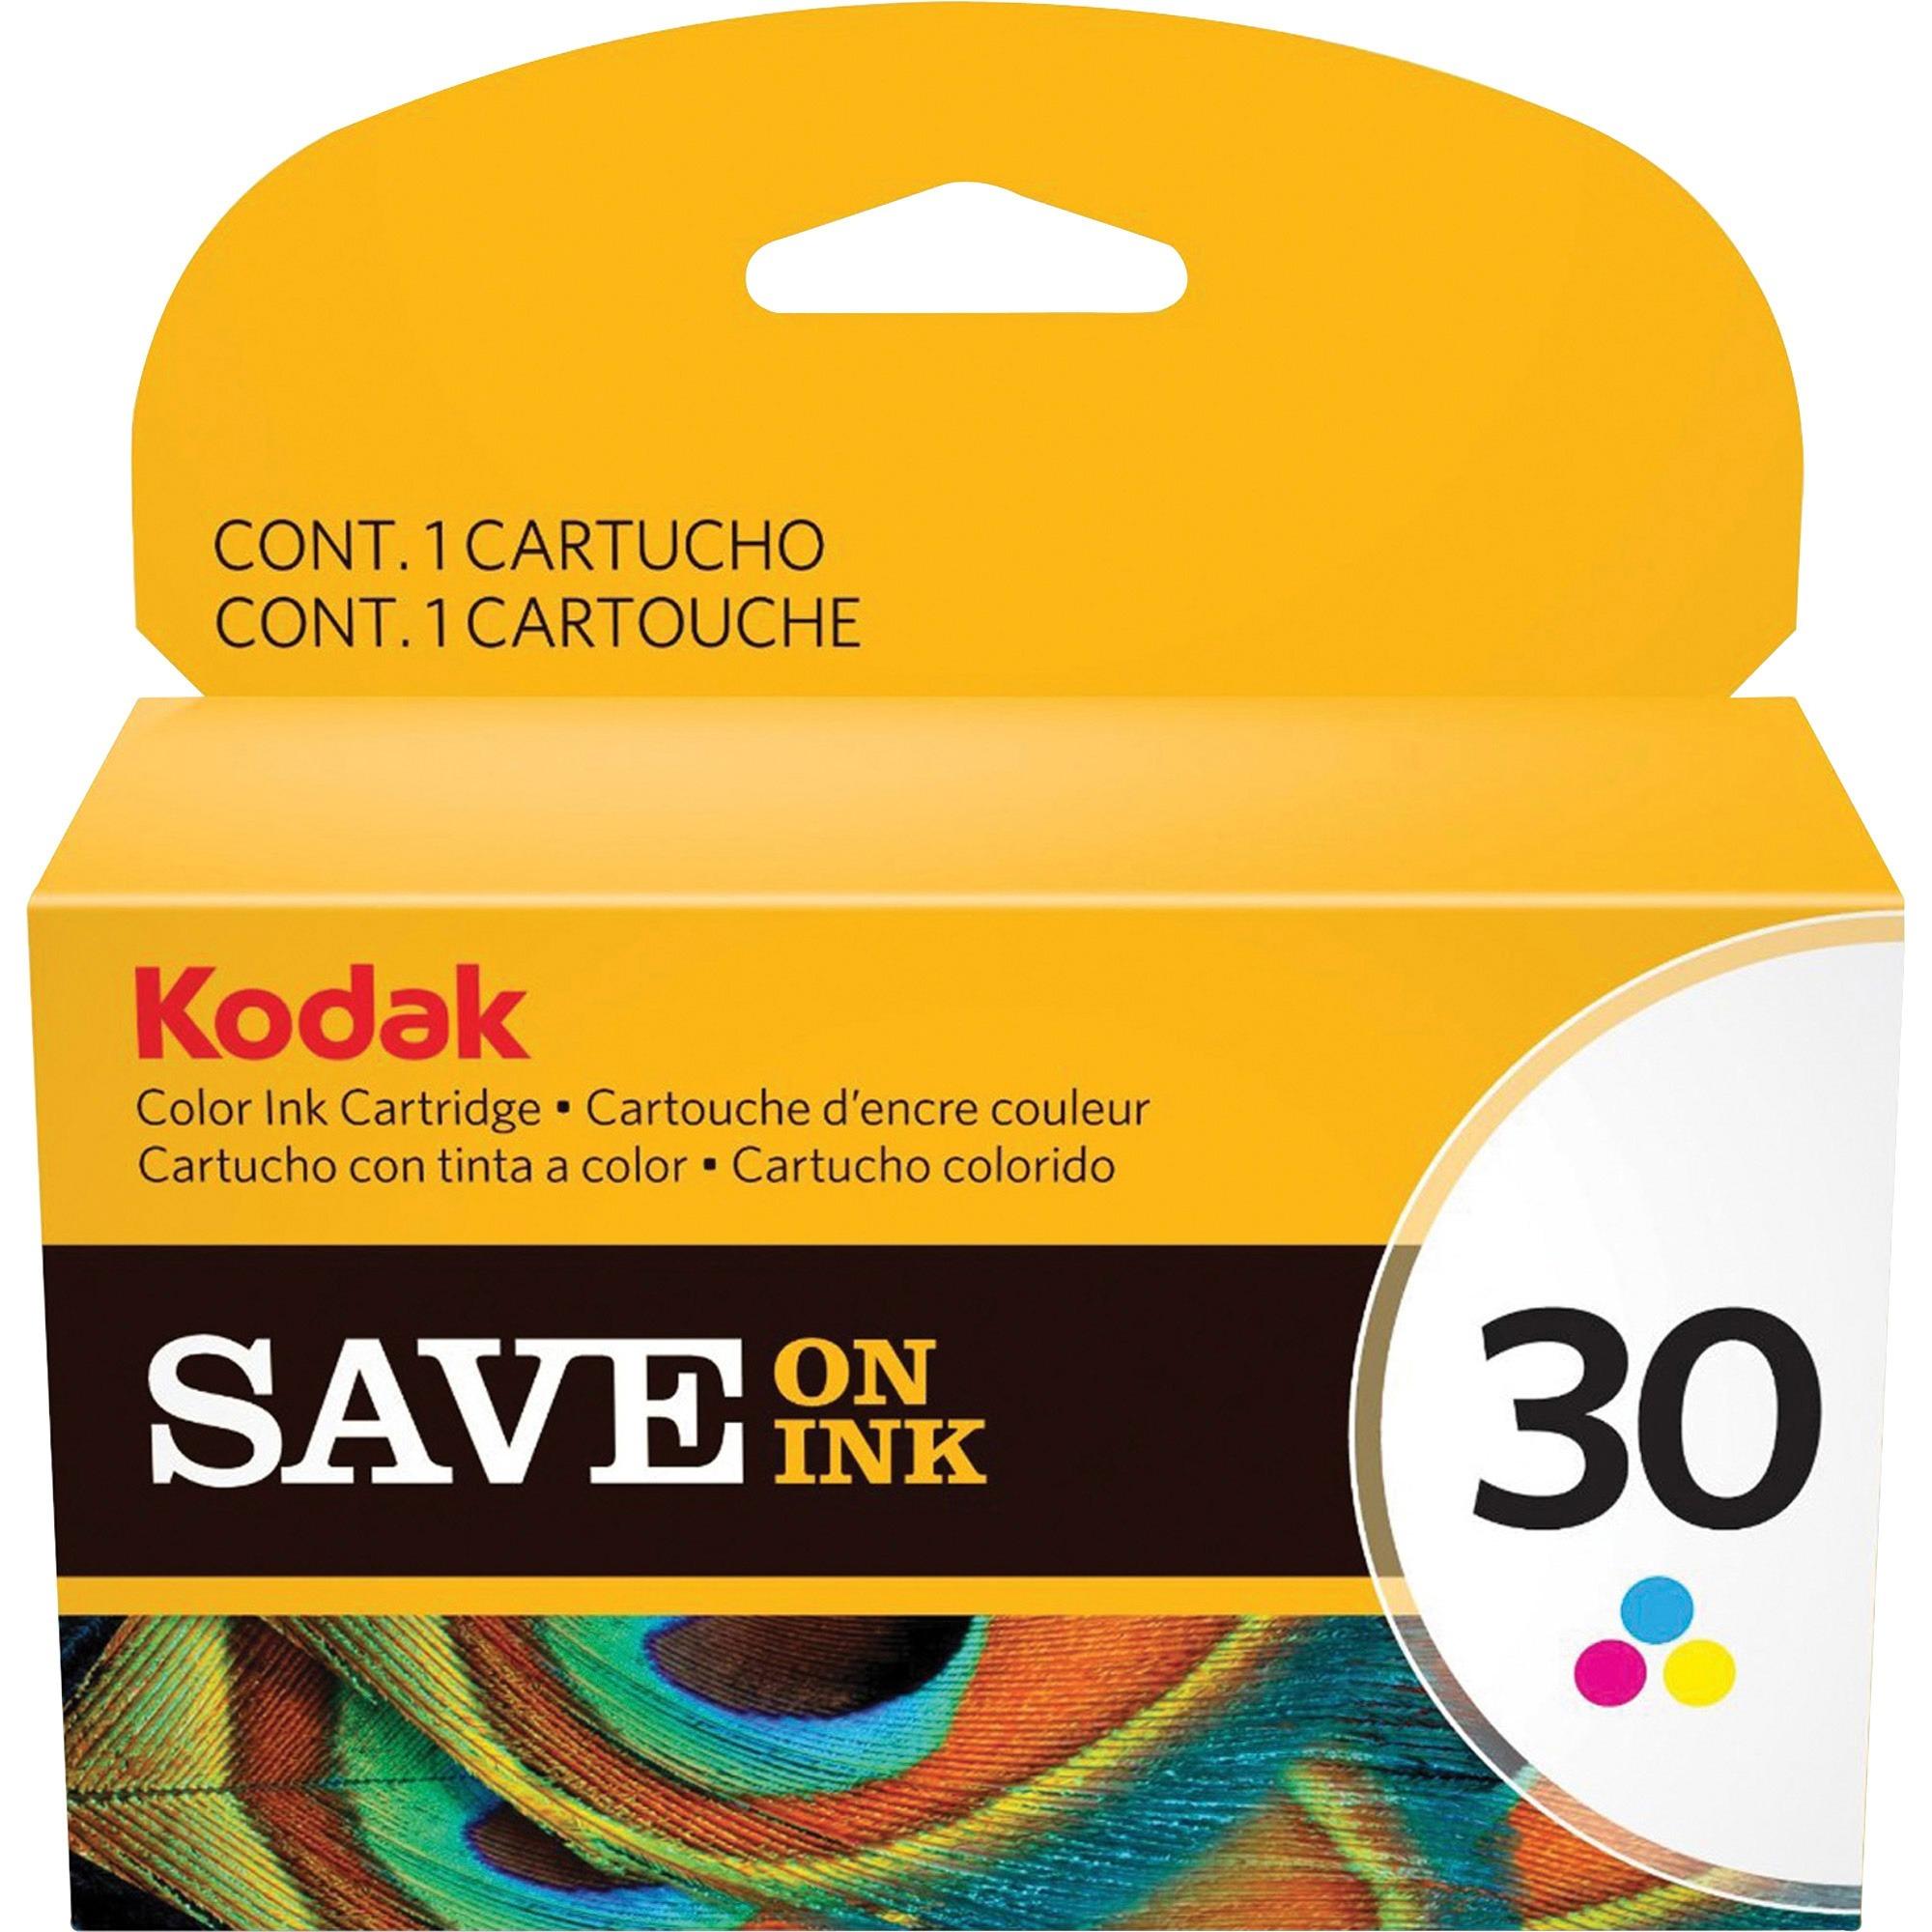 Kodak, KOD1022854, 1022854 Ink Cartridge, 1 Each